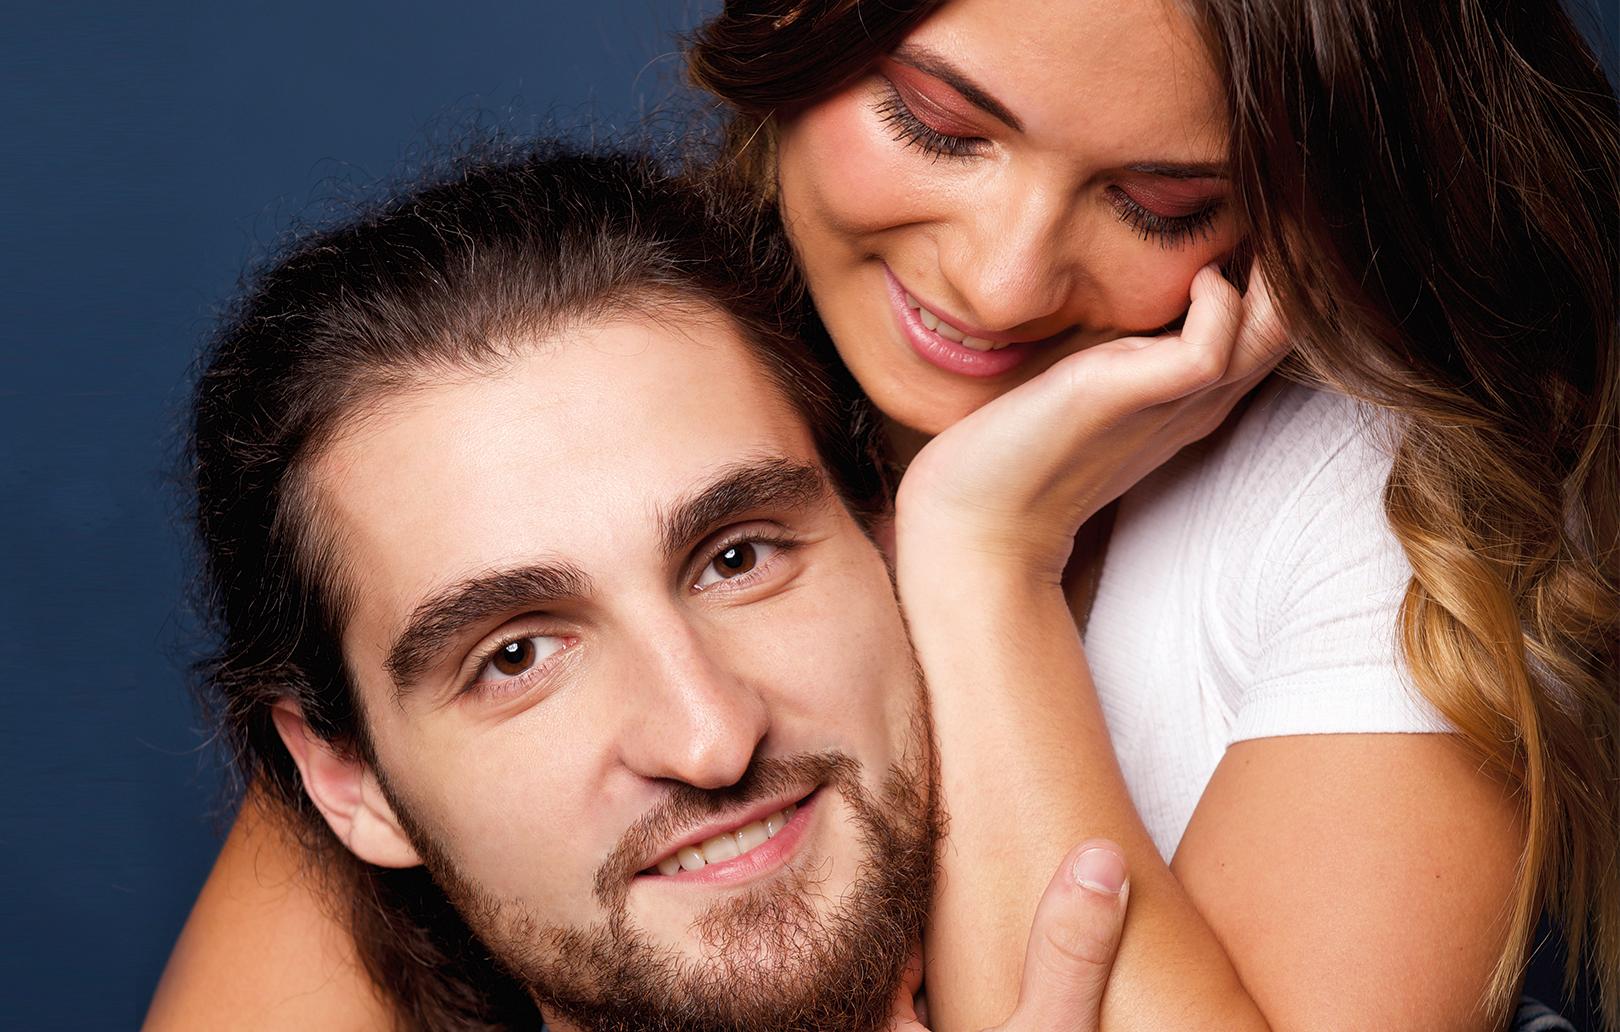 partner-fotoshooting-leipzig-bg41617889524